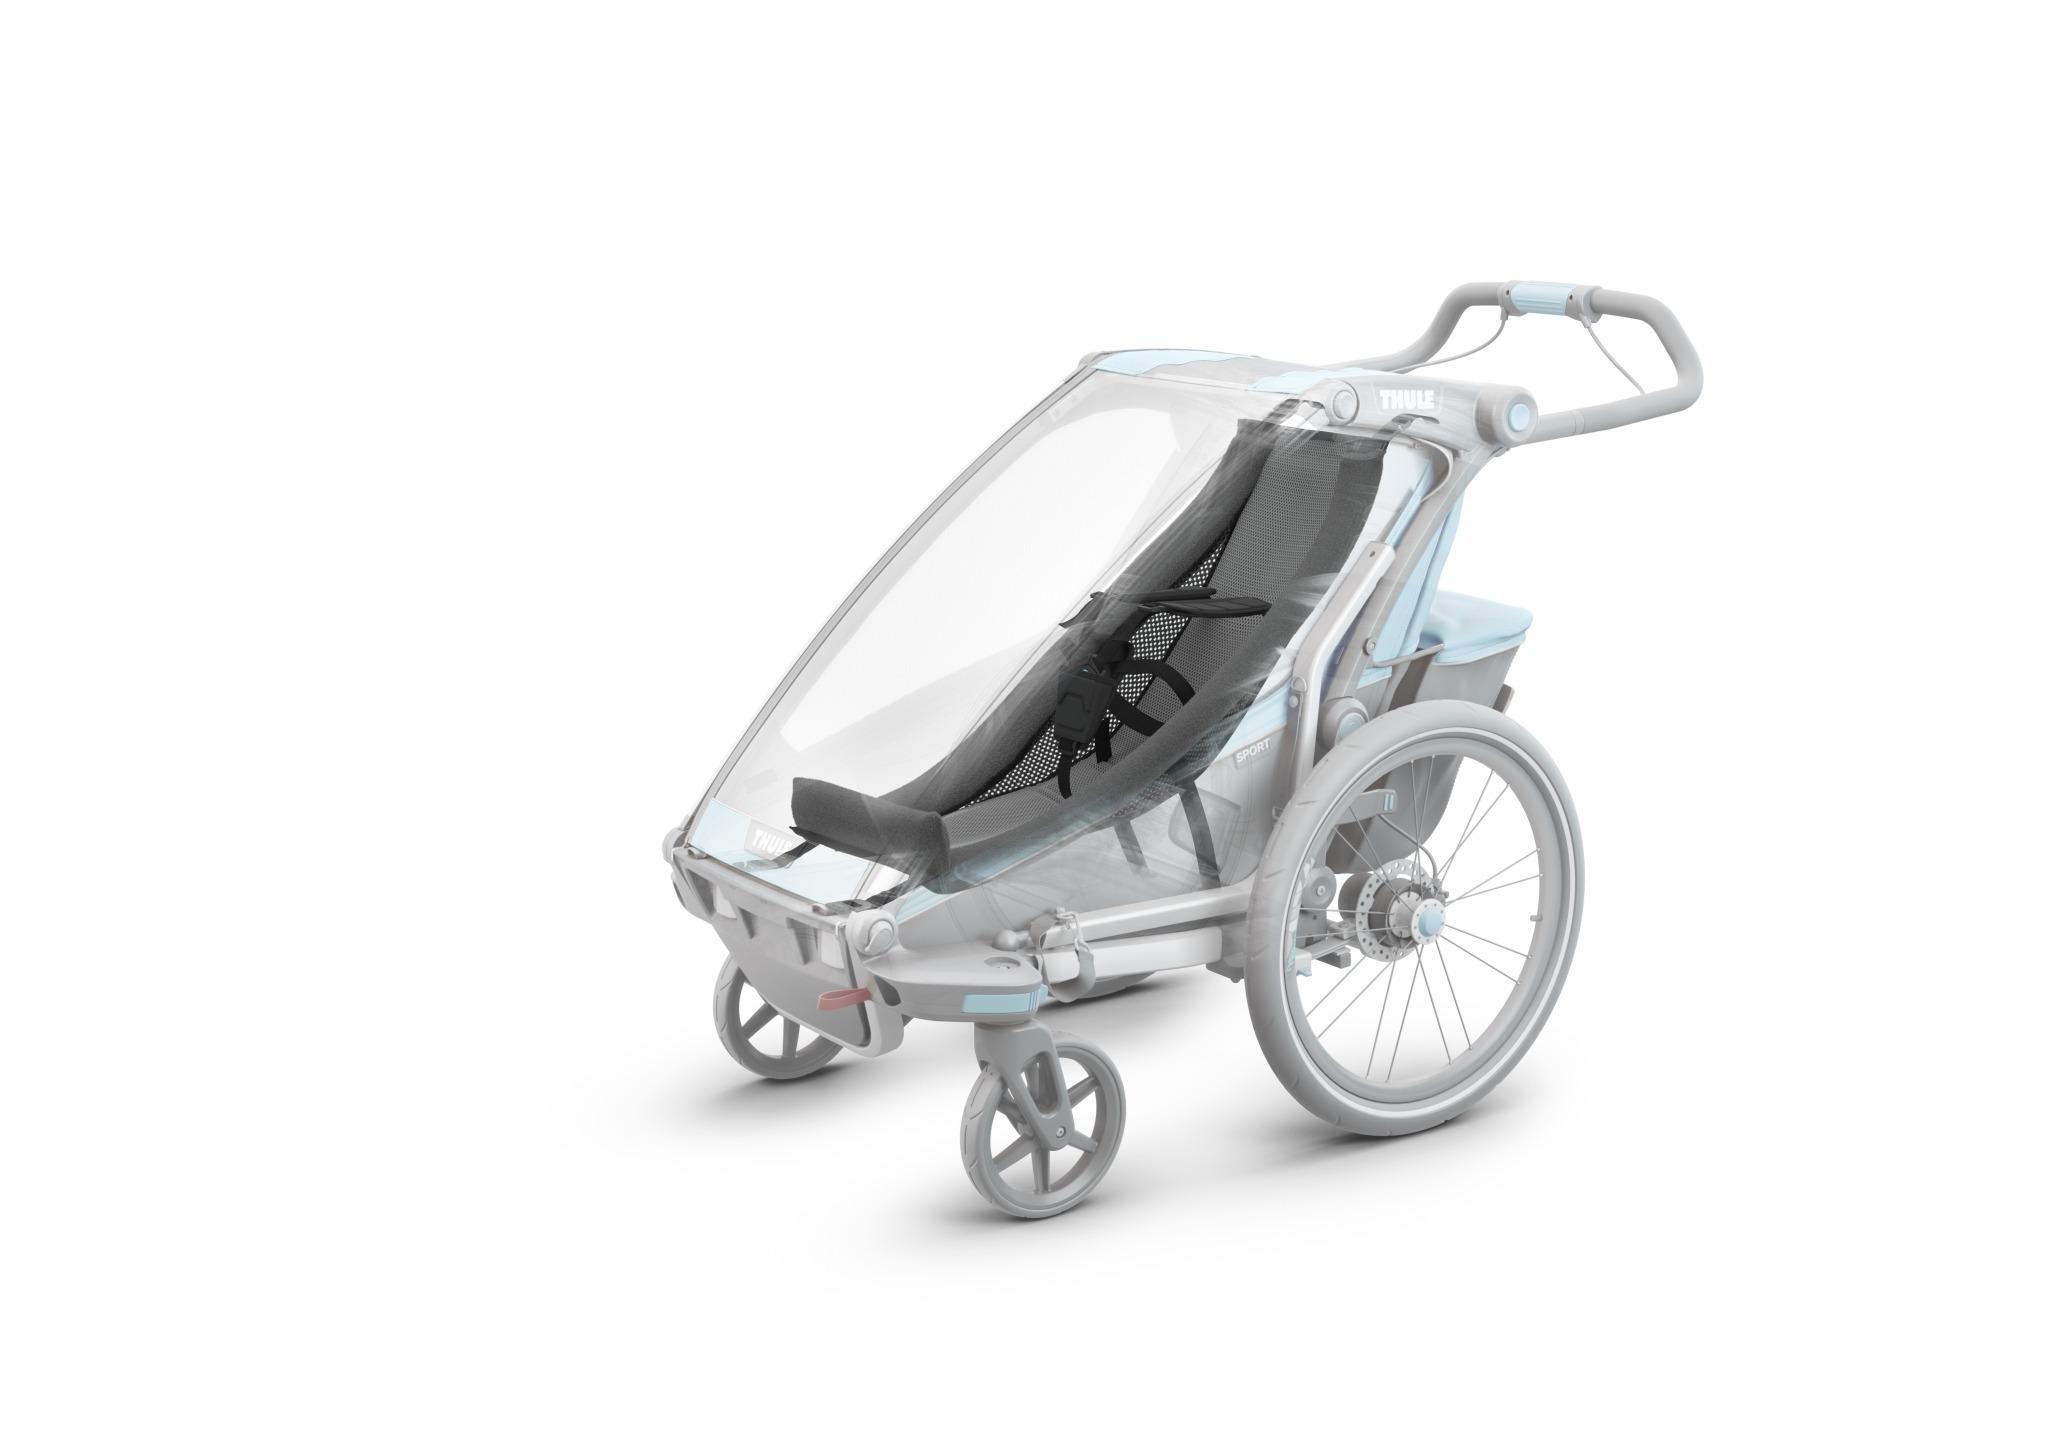 THULE Chariot - Hamaczek dla niemowląt